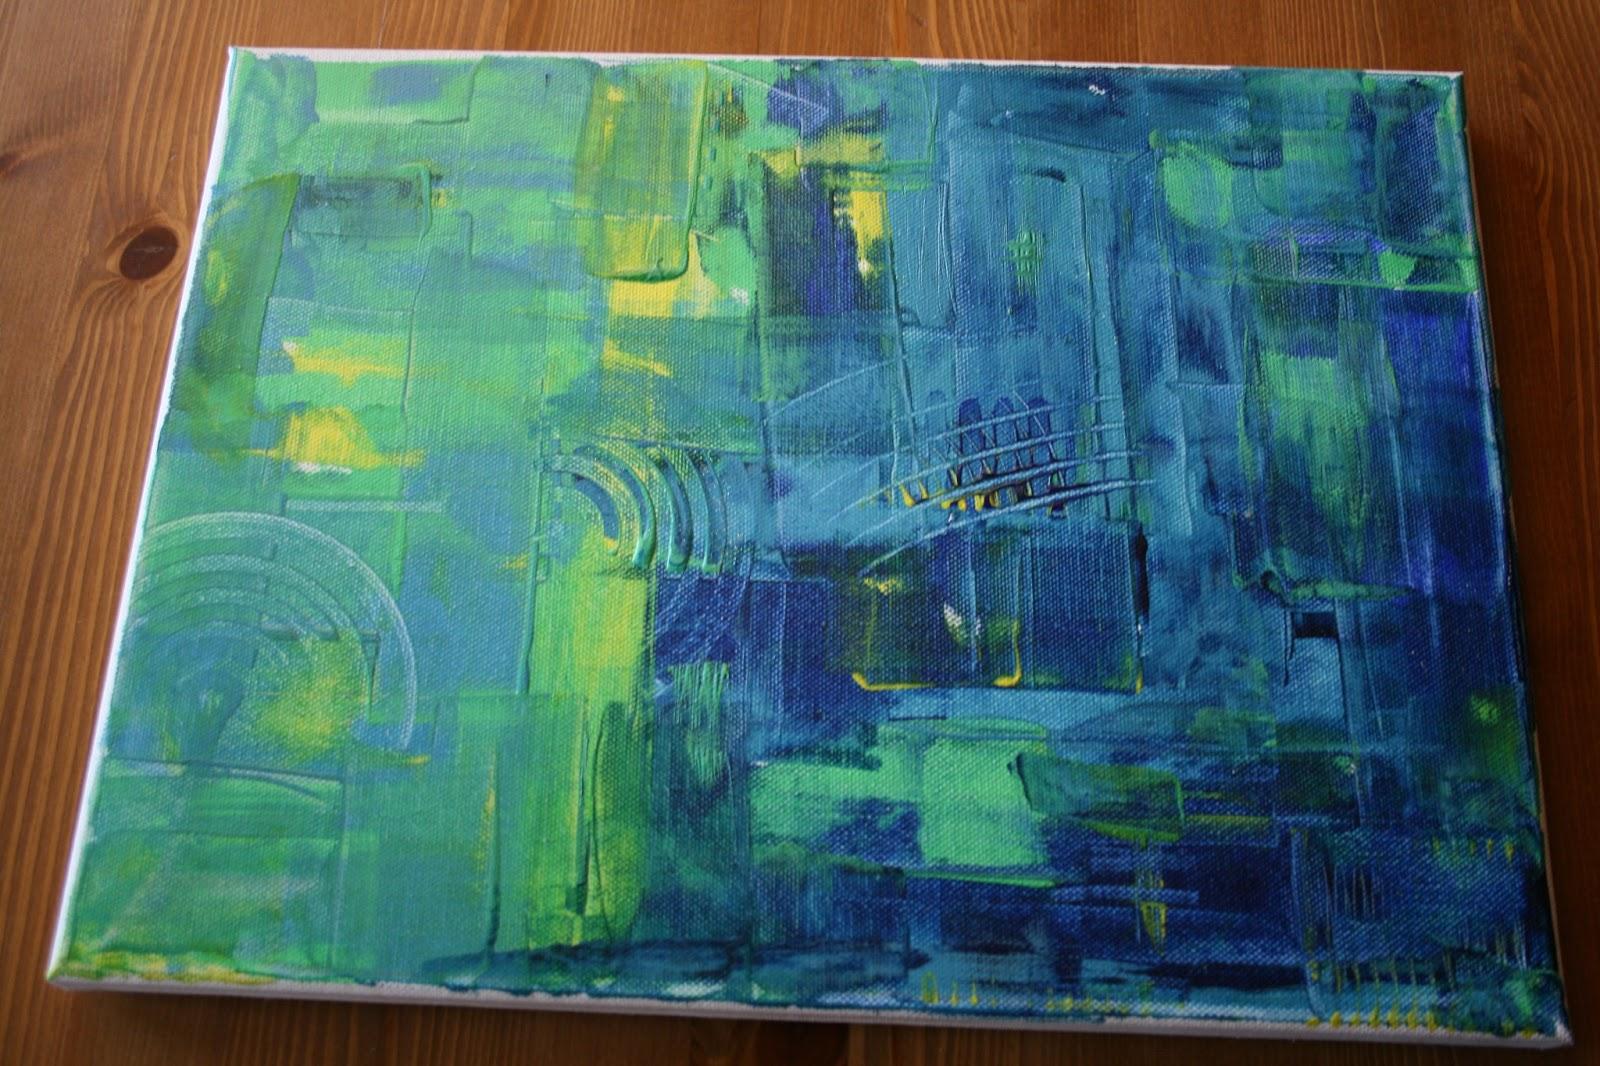 Acryl in blau, grün und gelb